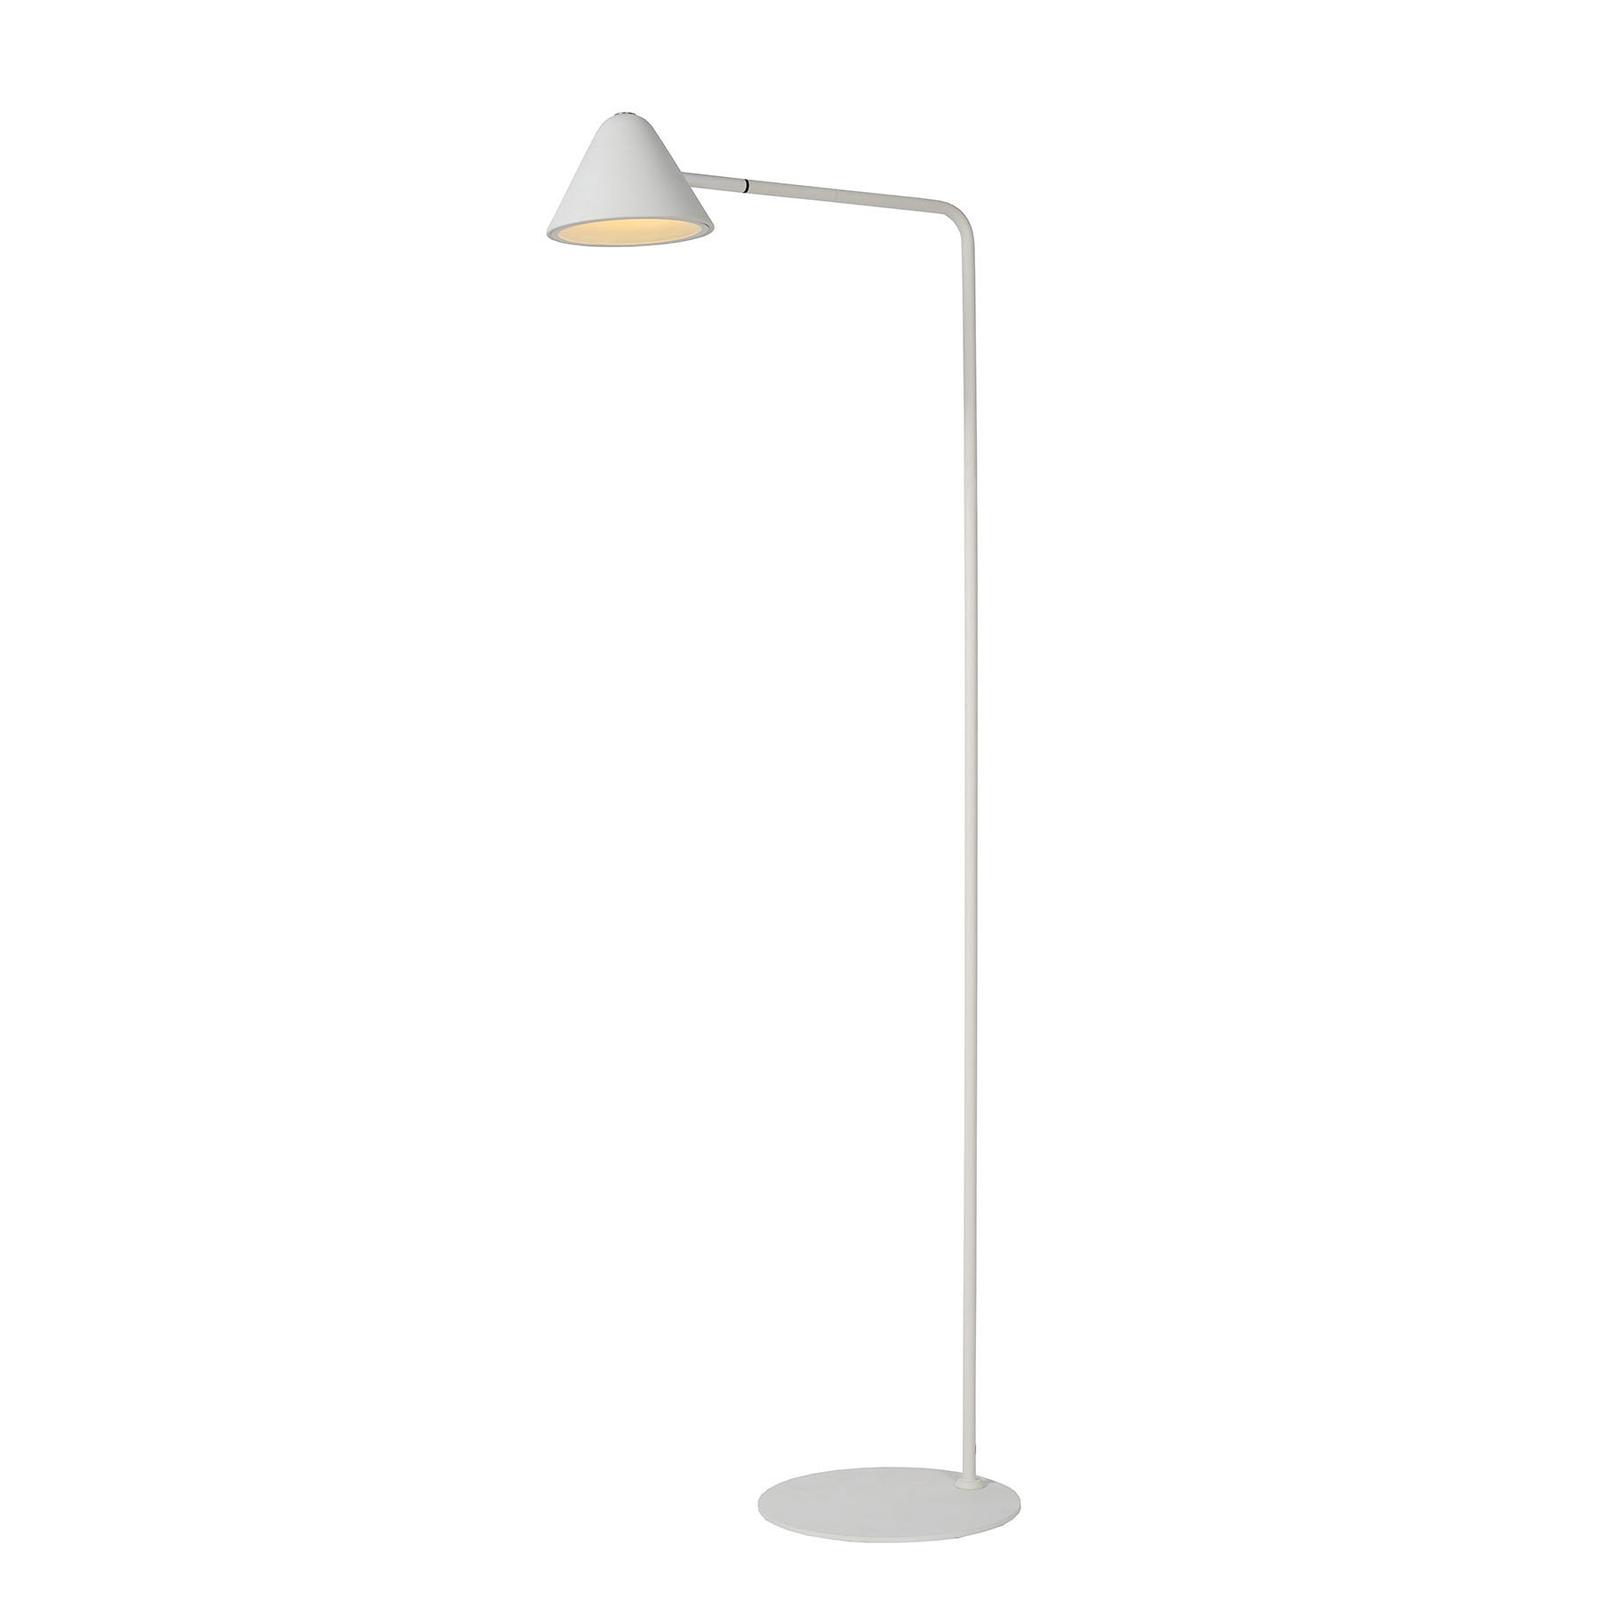 LED-lattiavalo Devon metallia, valkoinen